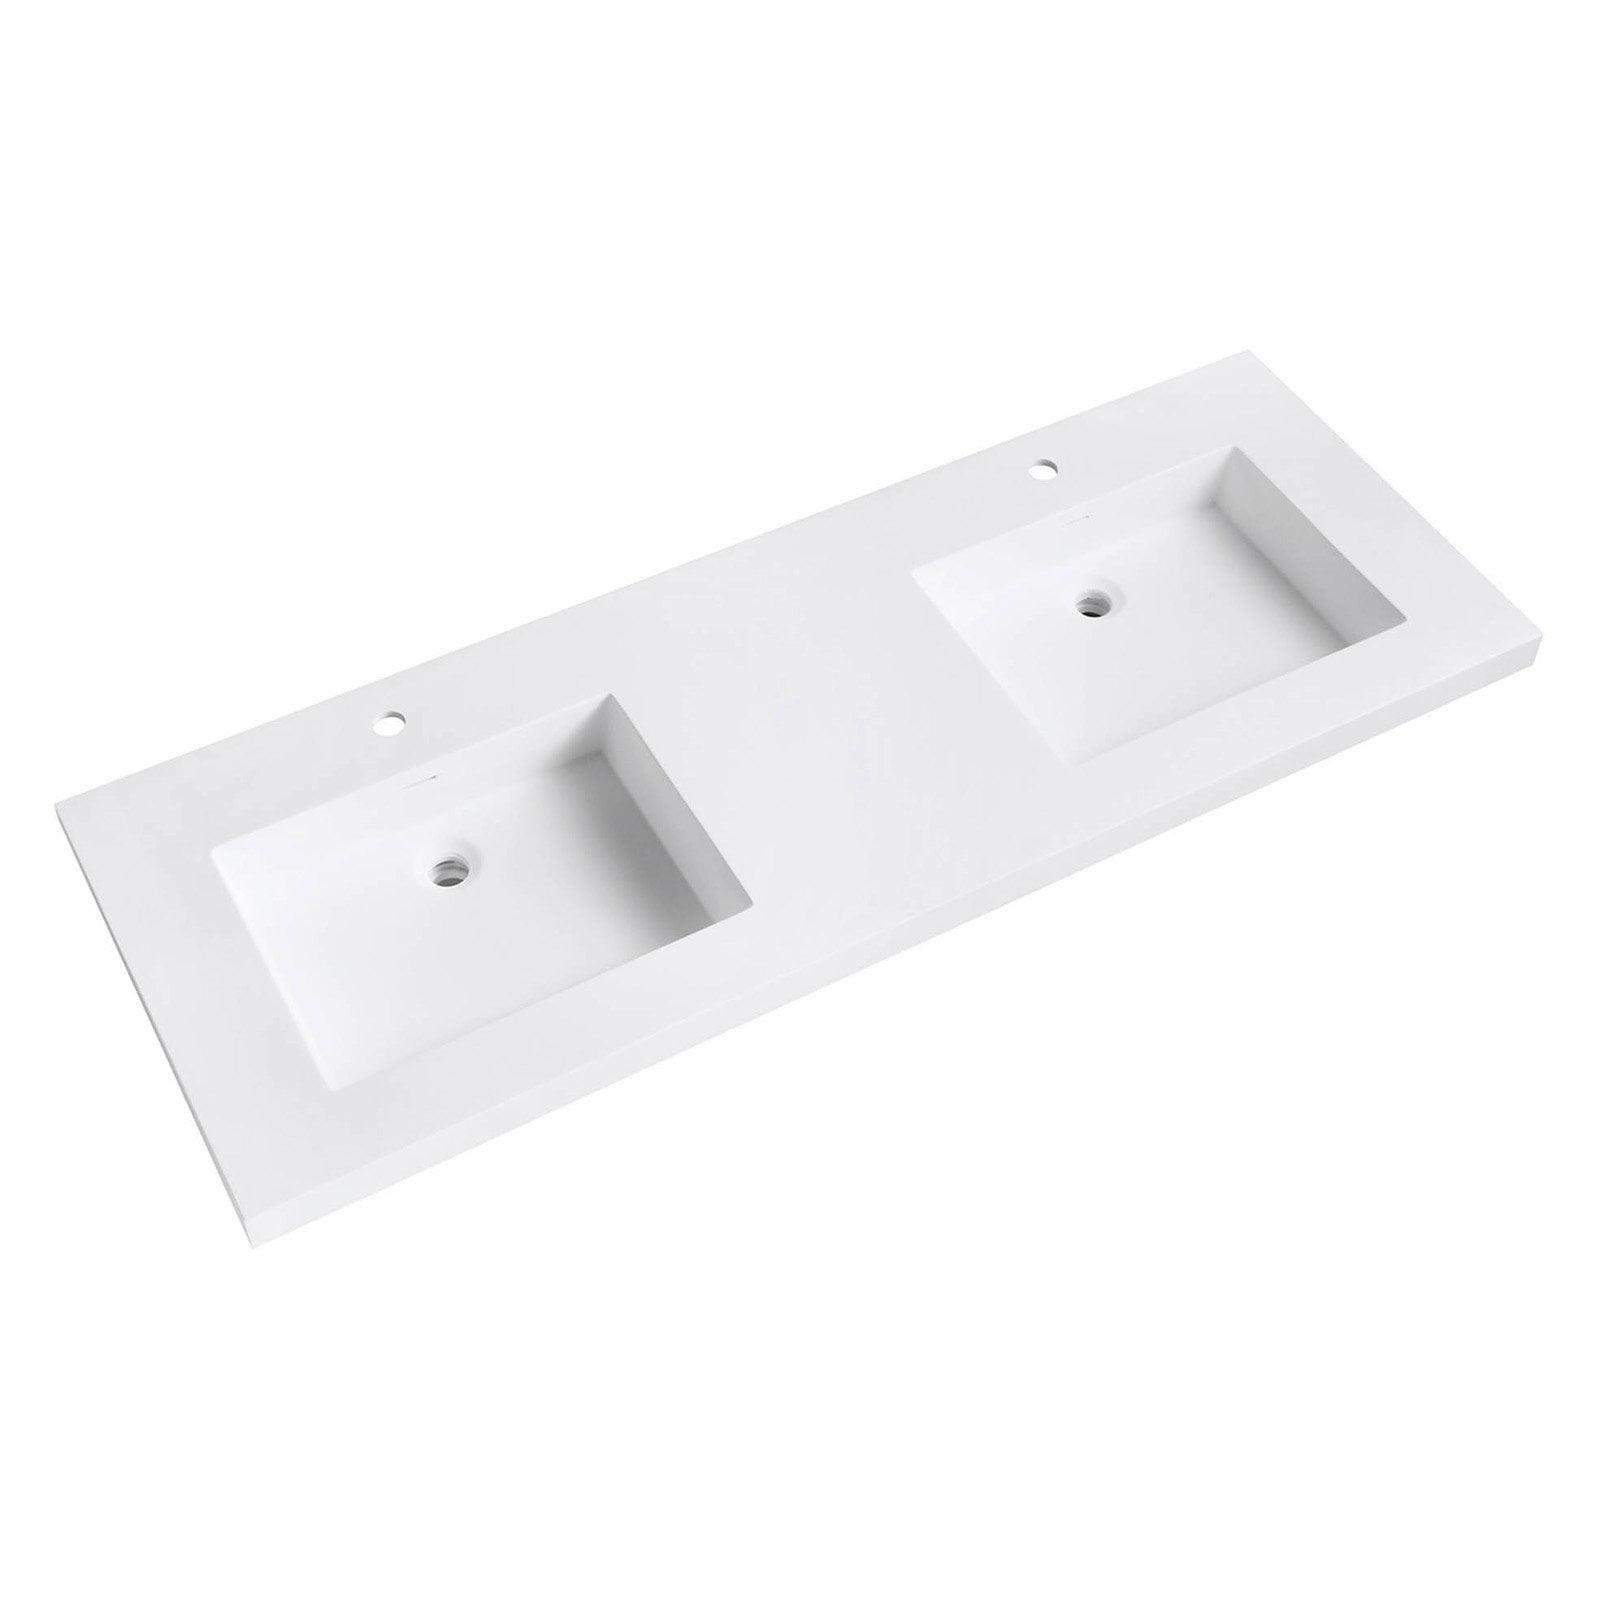 Superieur Avanity VersaStone 61 In. Acrylic Double Sink Vanity Top With Integrated  Sinks   Walmart.com